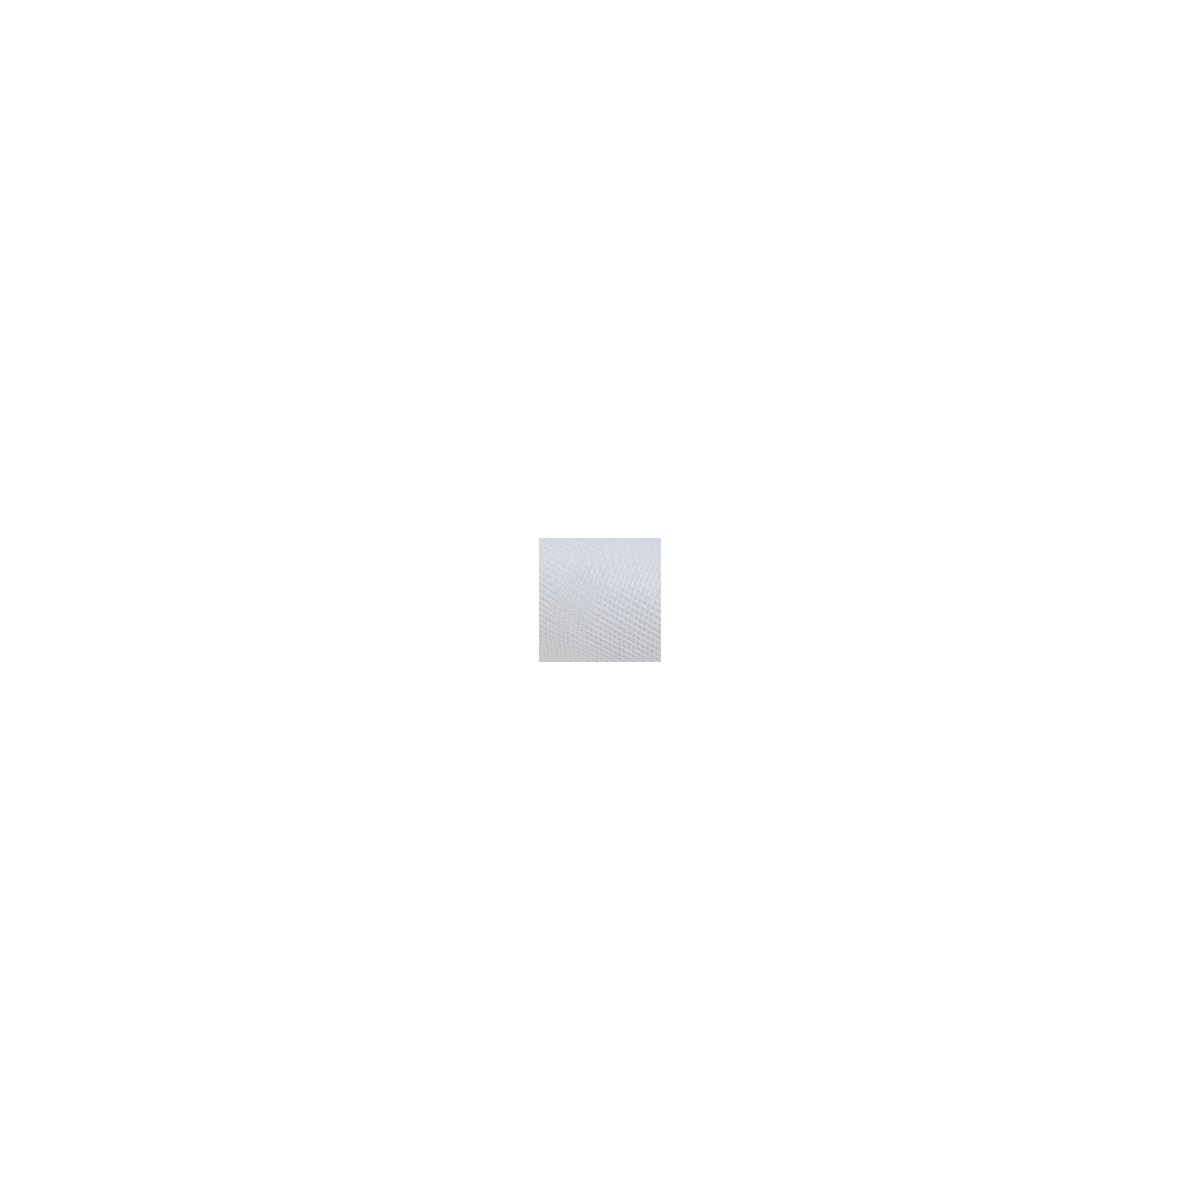 Deconet Telo Retina Cm.54x9,2 Mt. Bianco